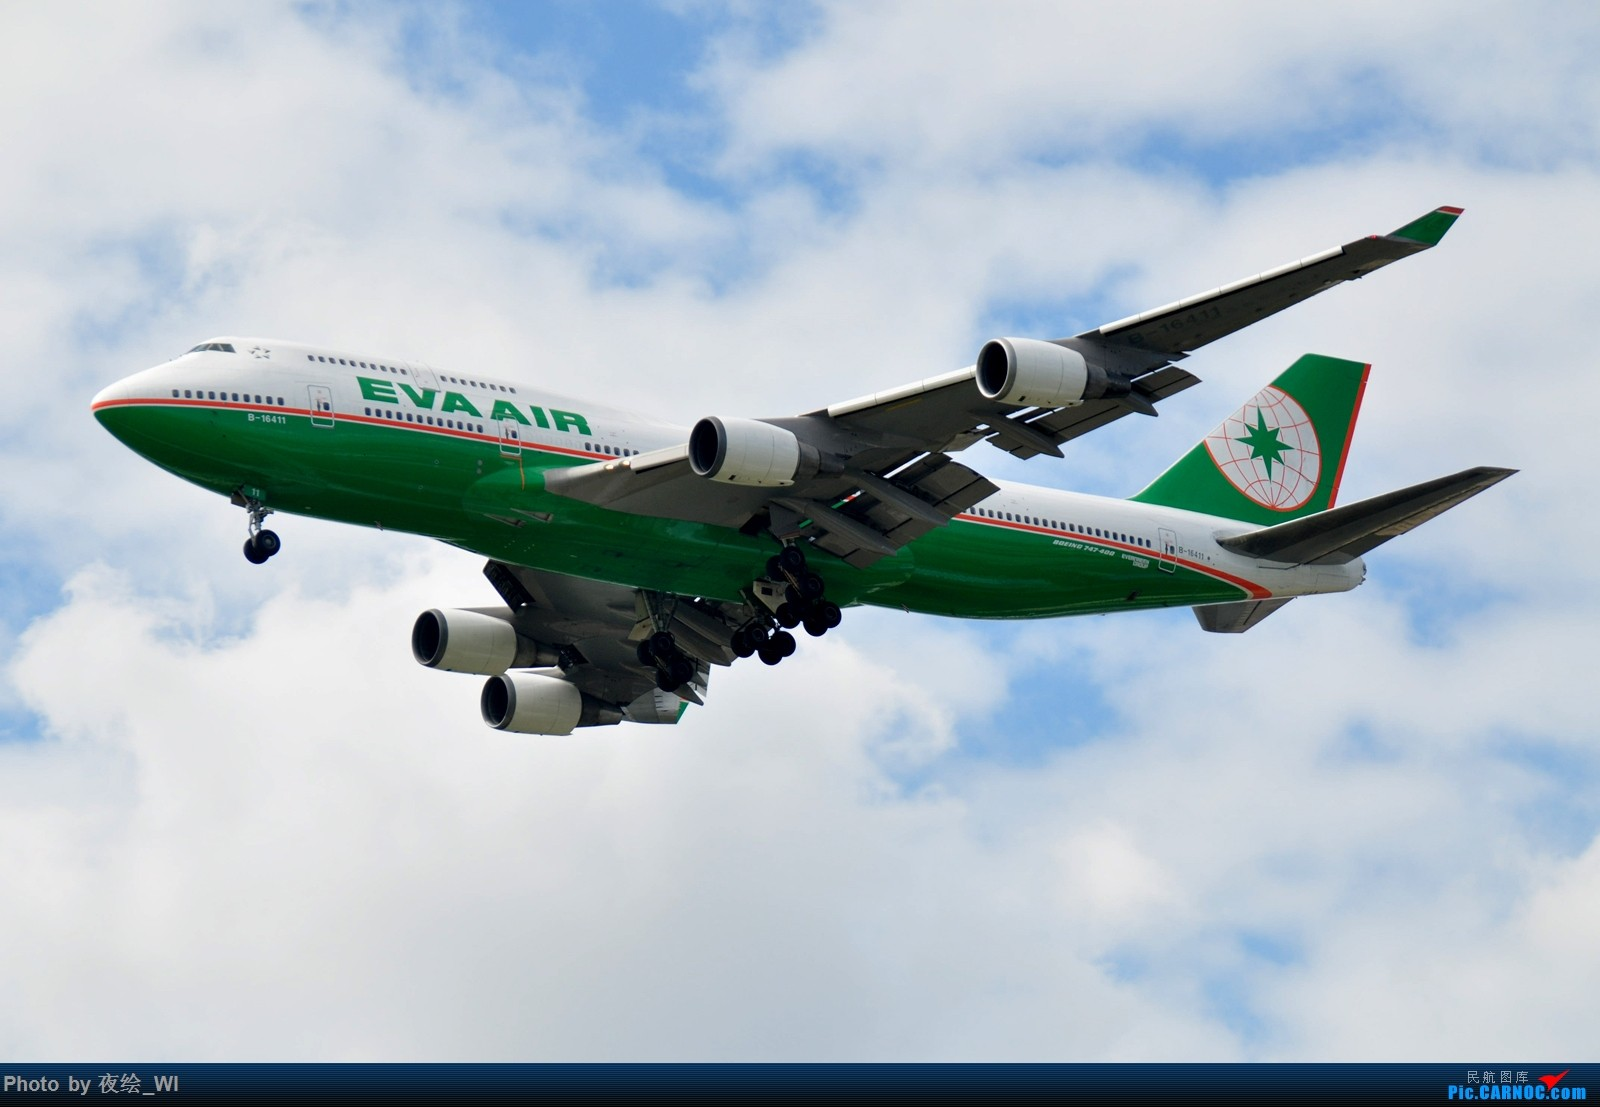 Re:[原创]【PVG】不只守着NKG,国庆疯狂拍机之浦东行,天空美得简直不像话! BOEING 747-400 B-16411 中国上海浦东国际机场